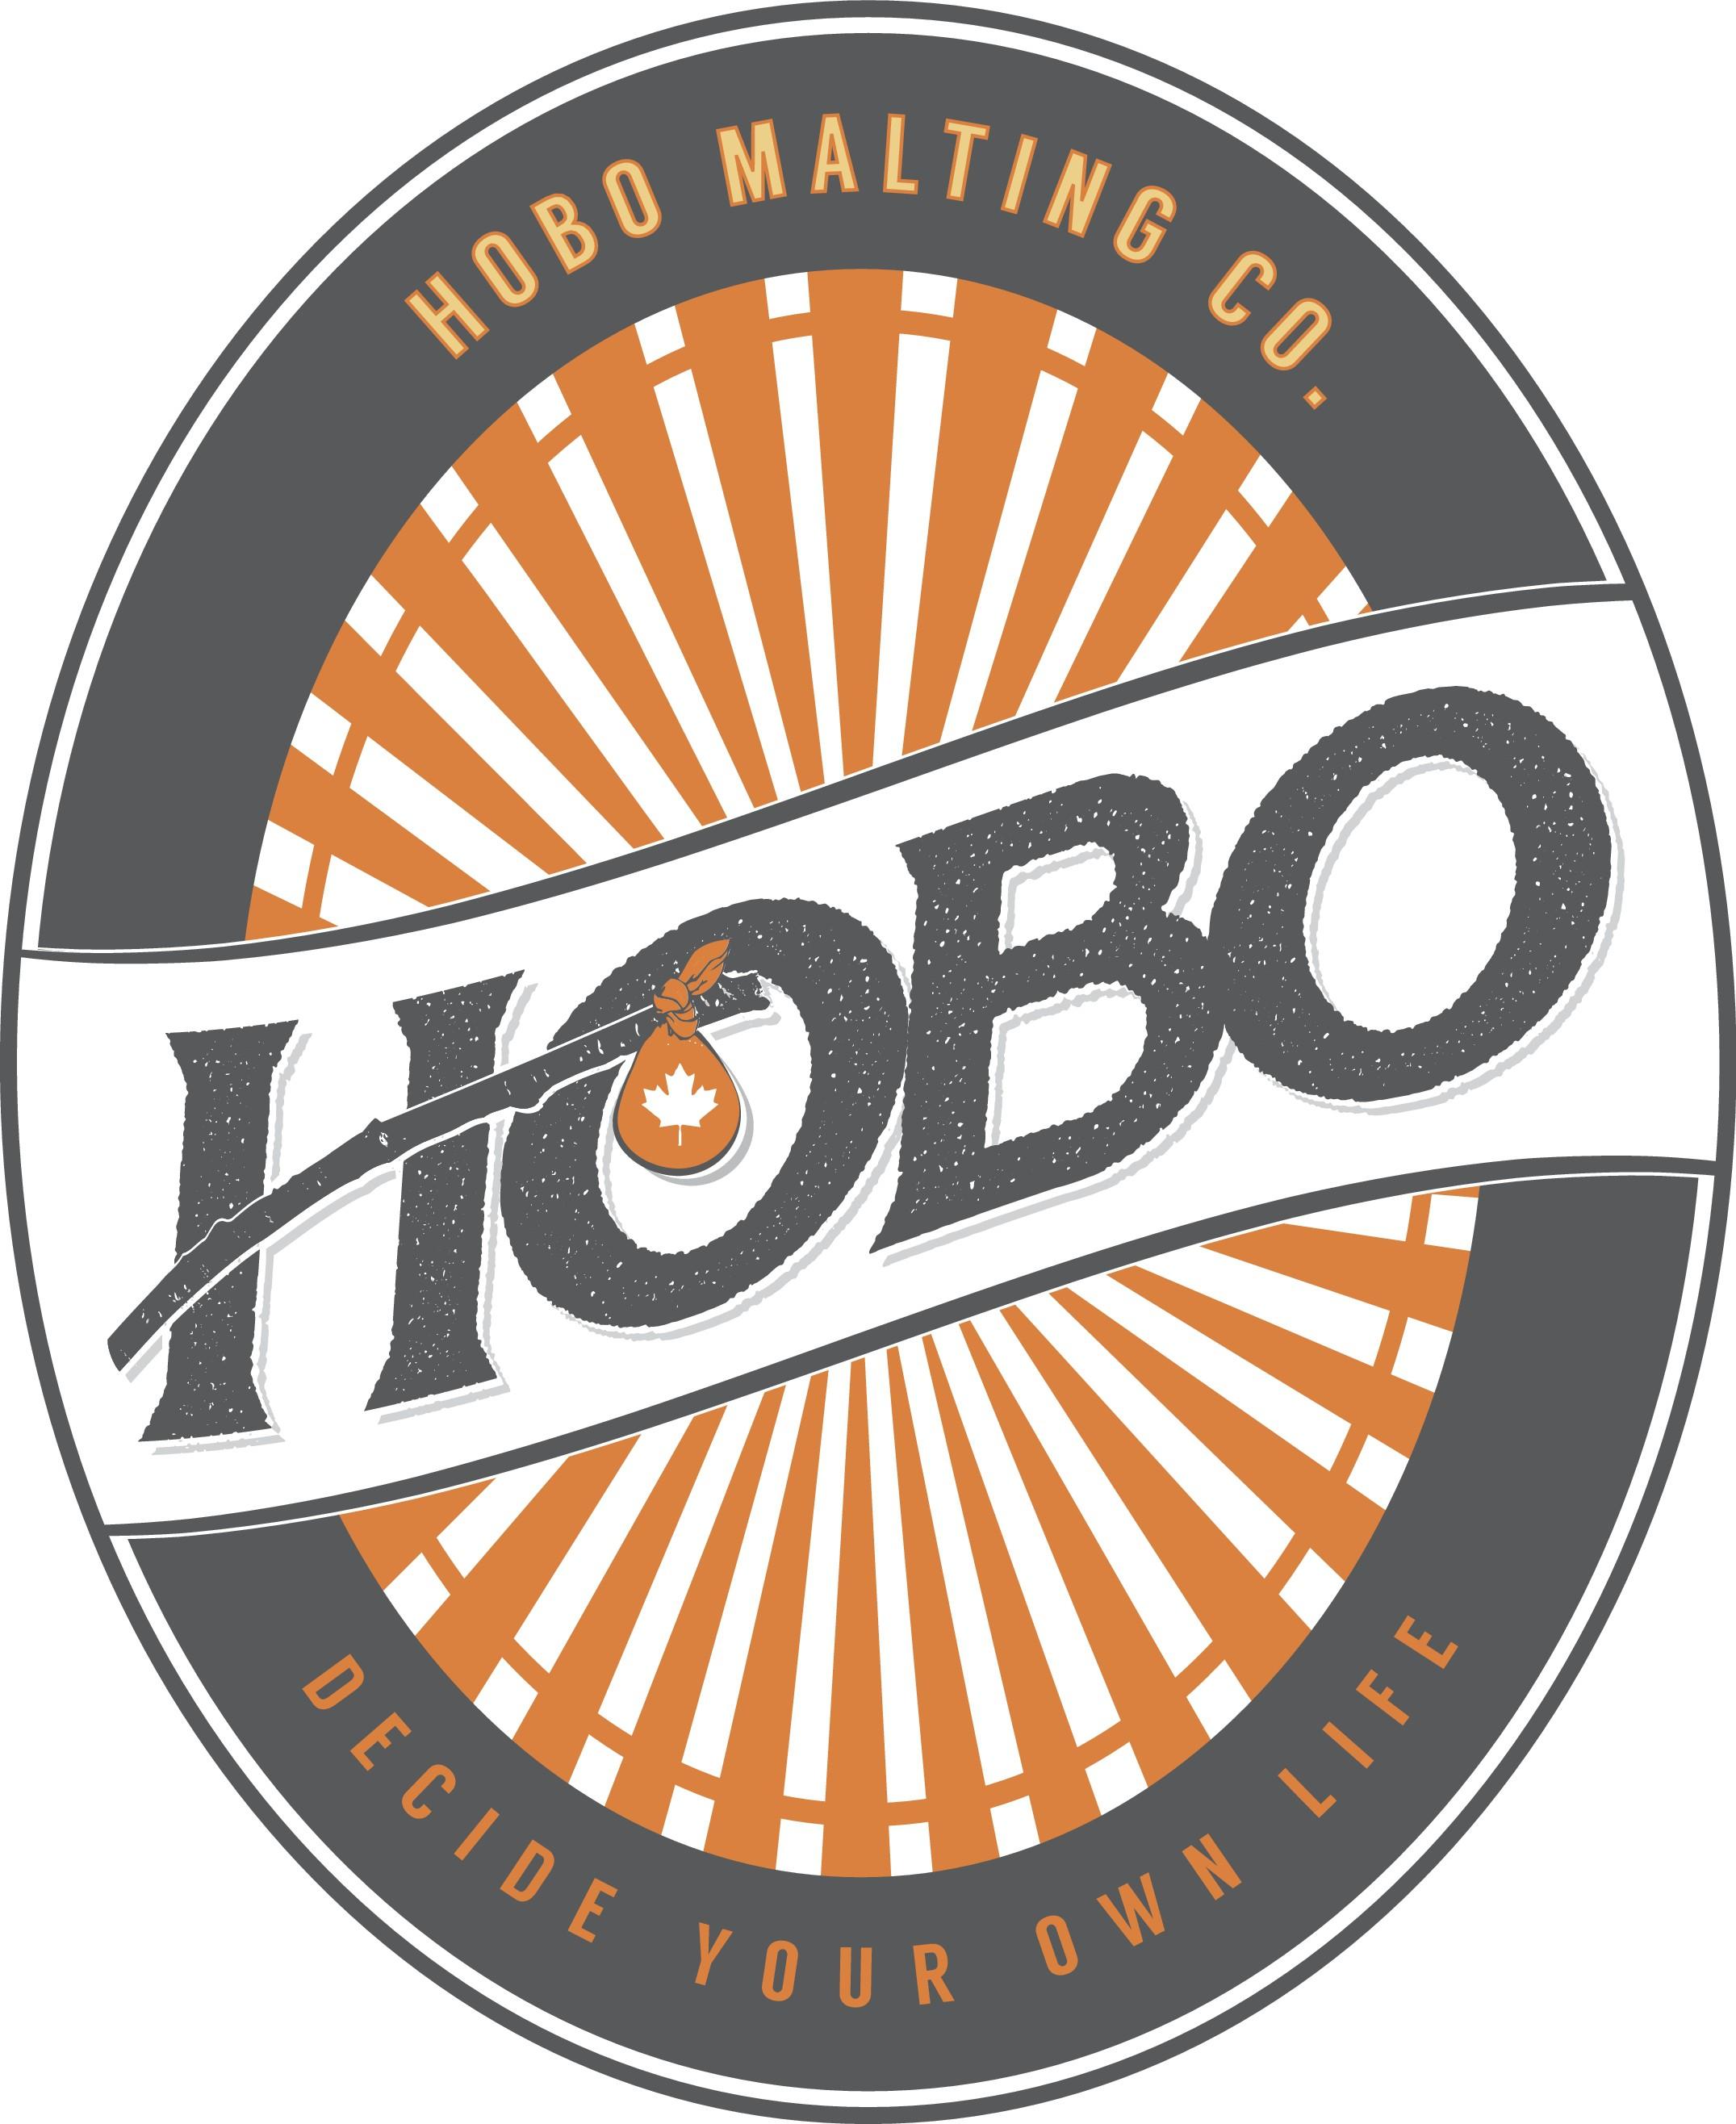 Creative brewery logo!